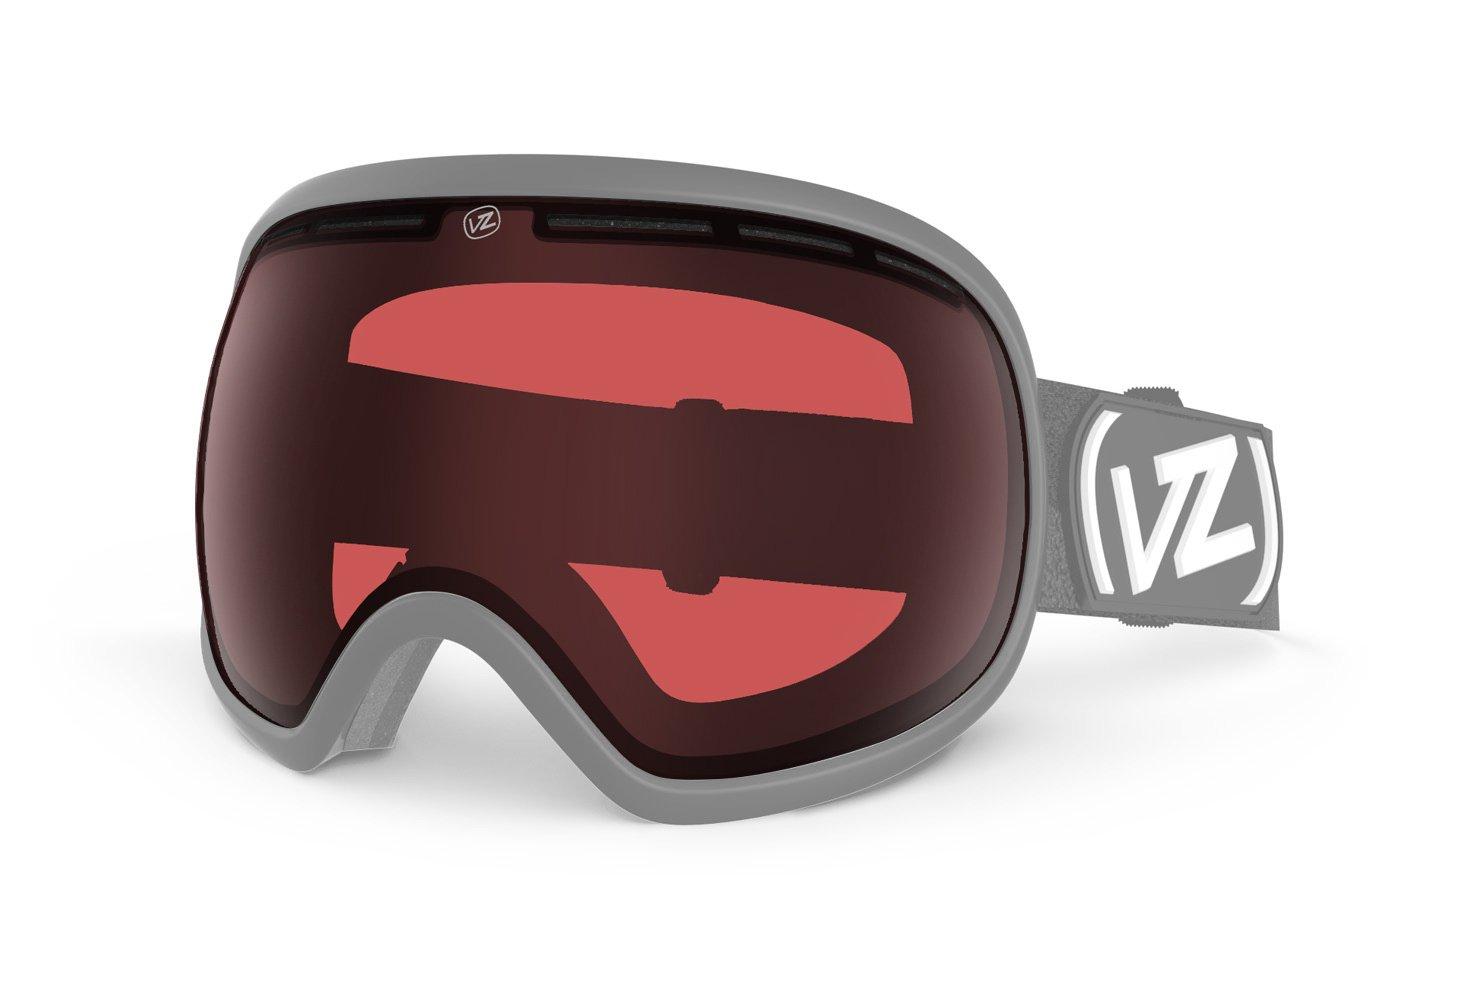 Amazon.com: VonZipper Fishbowl Replacement Lens,Rose Lens,One Size ...